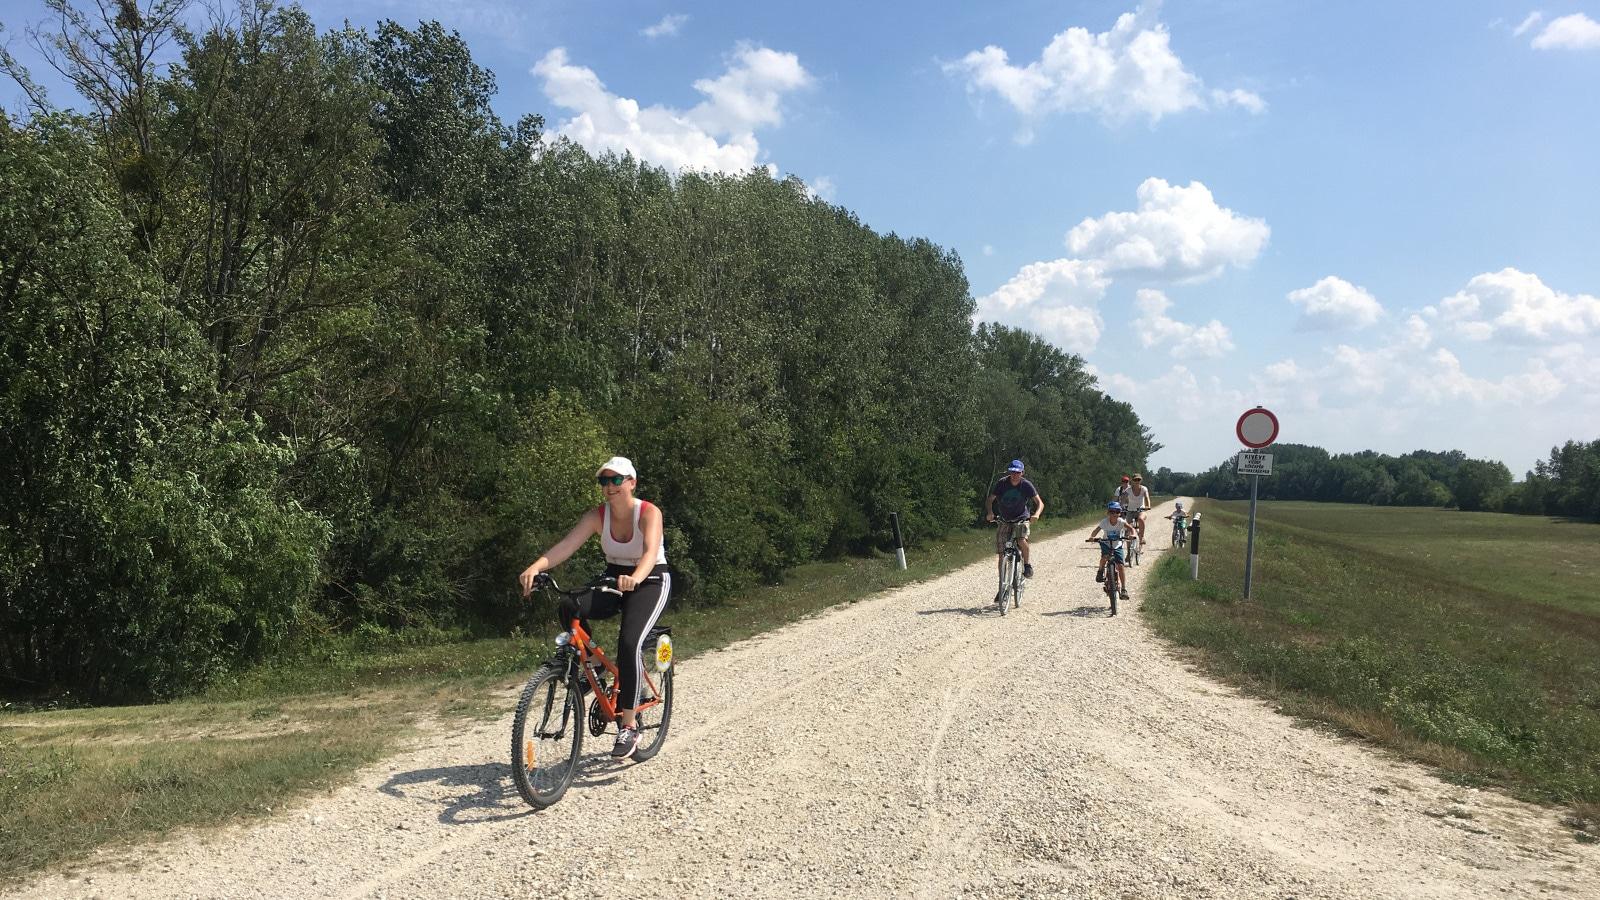 Lassú turizmus - biciklitúrák, vízitúrák, gyalogtúrák